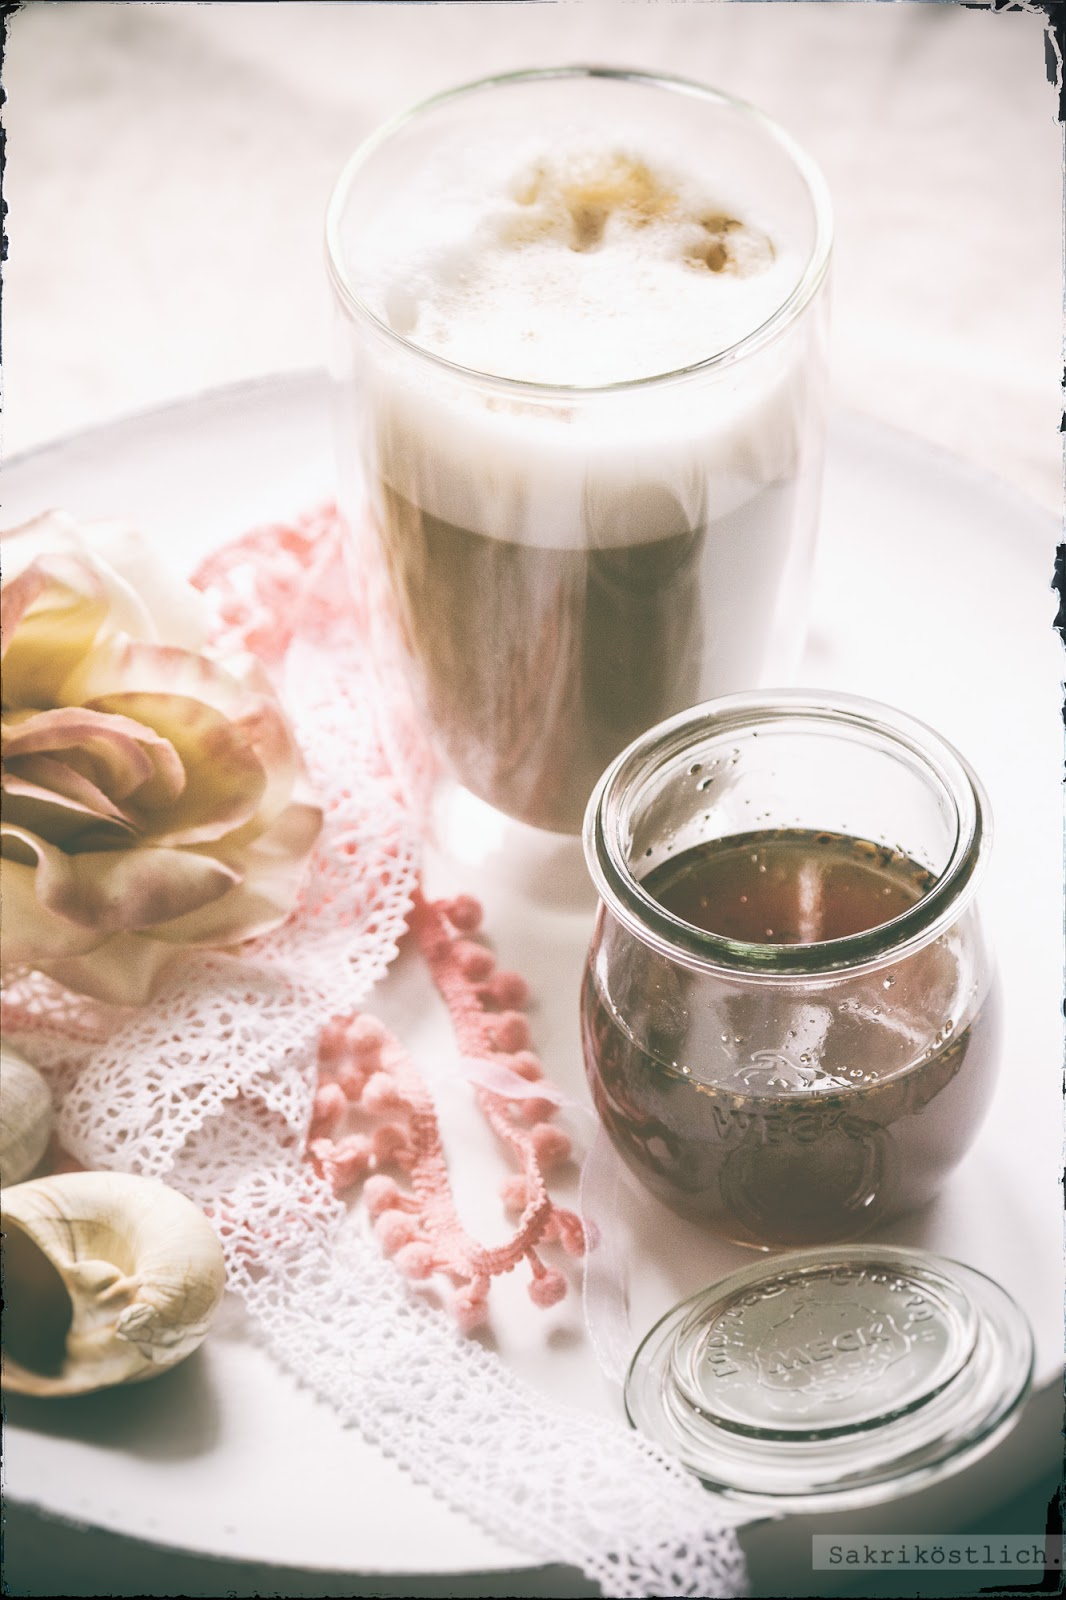 sakrik stlich latte macchiato mit chai sirup. Black Bedroom Furniture Sets. Home Design Ideas